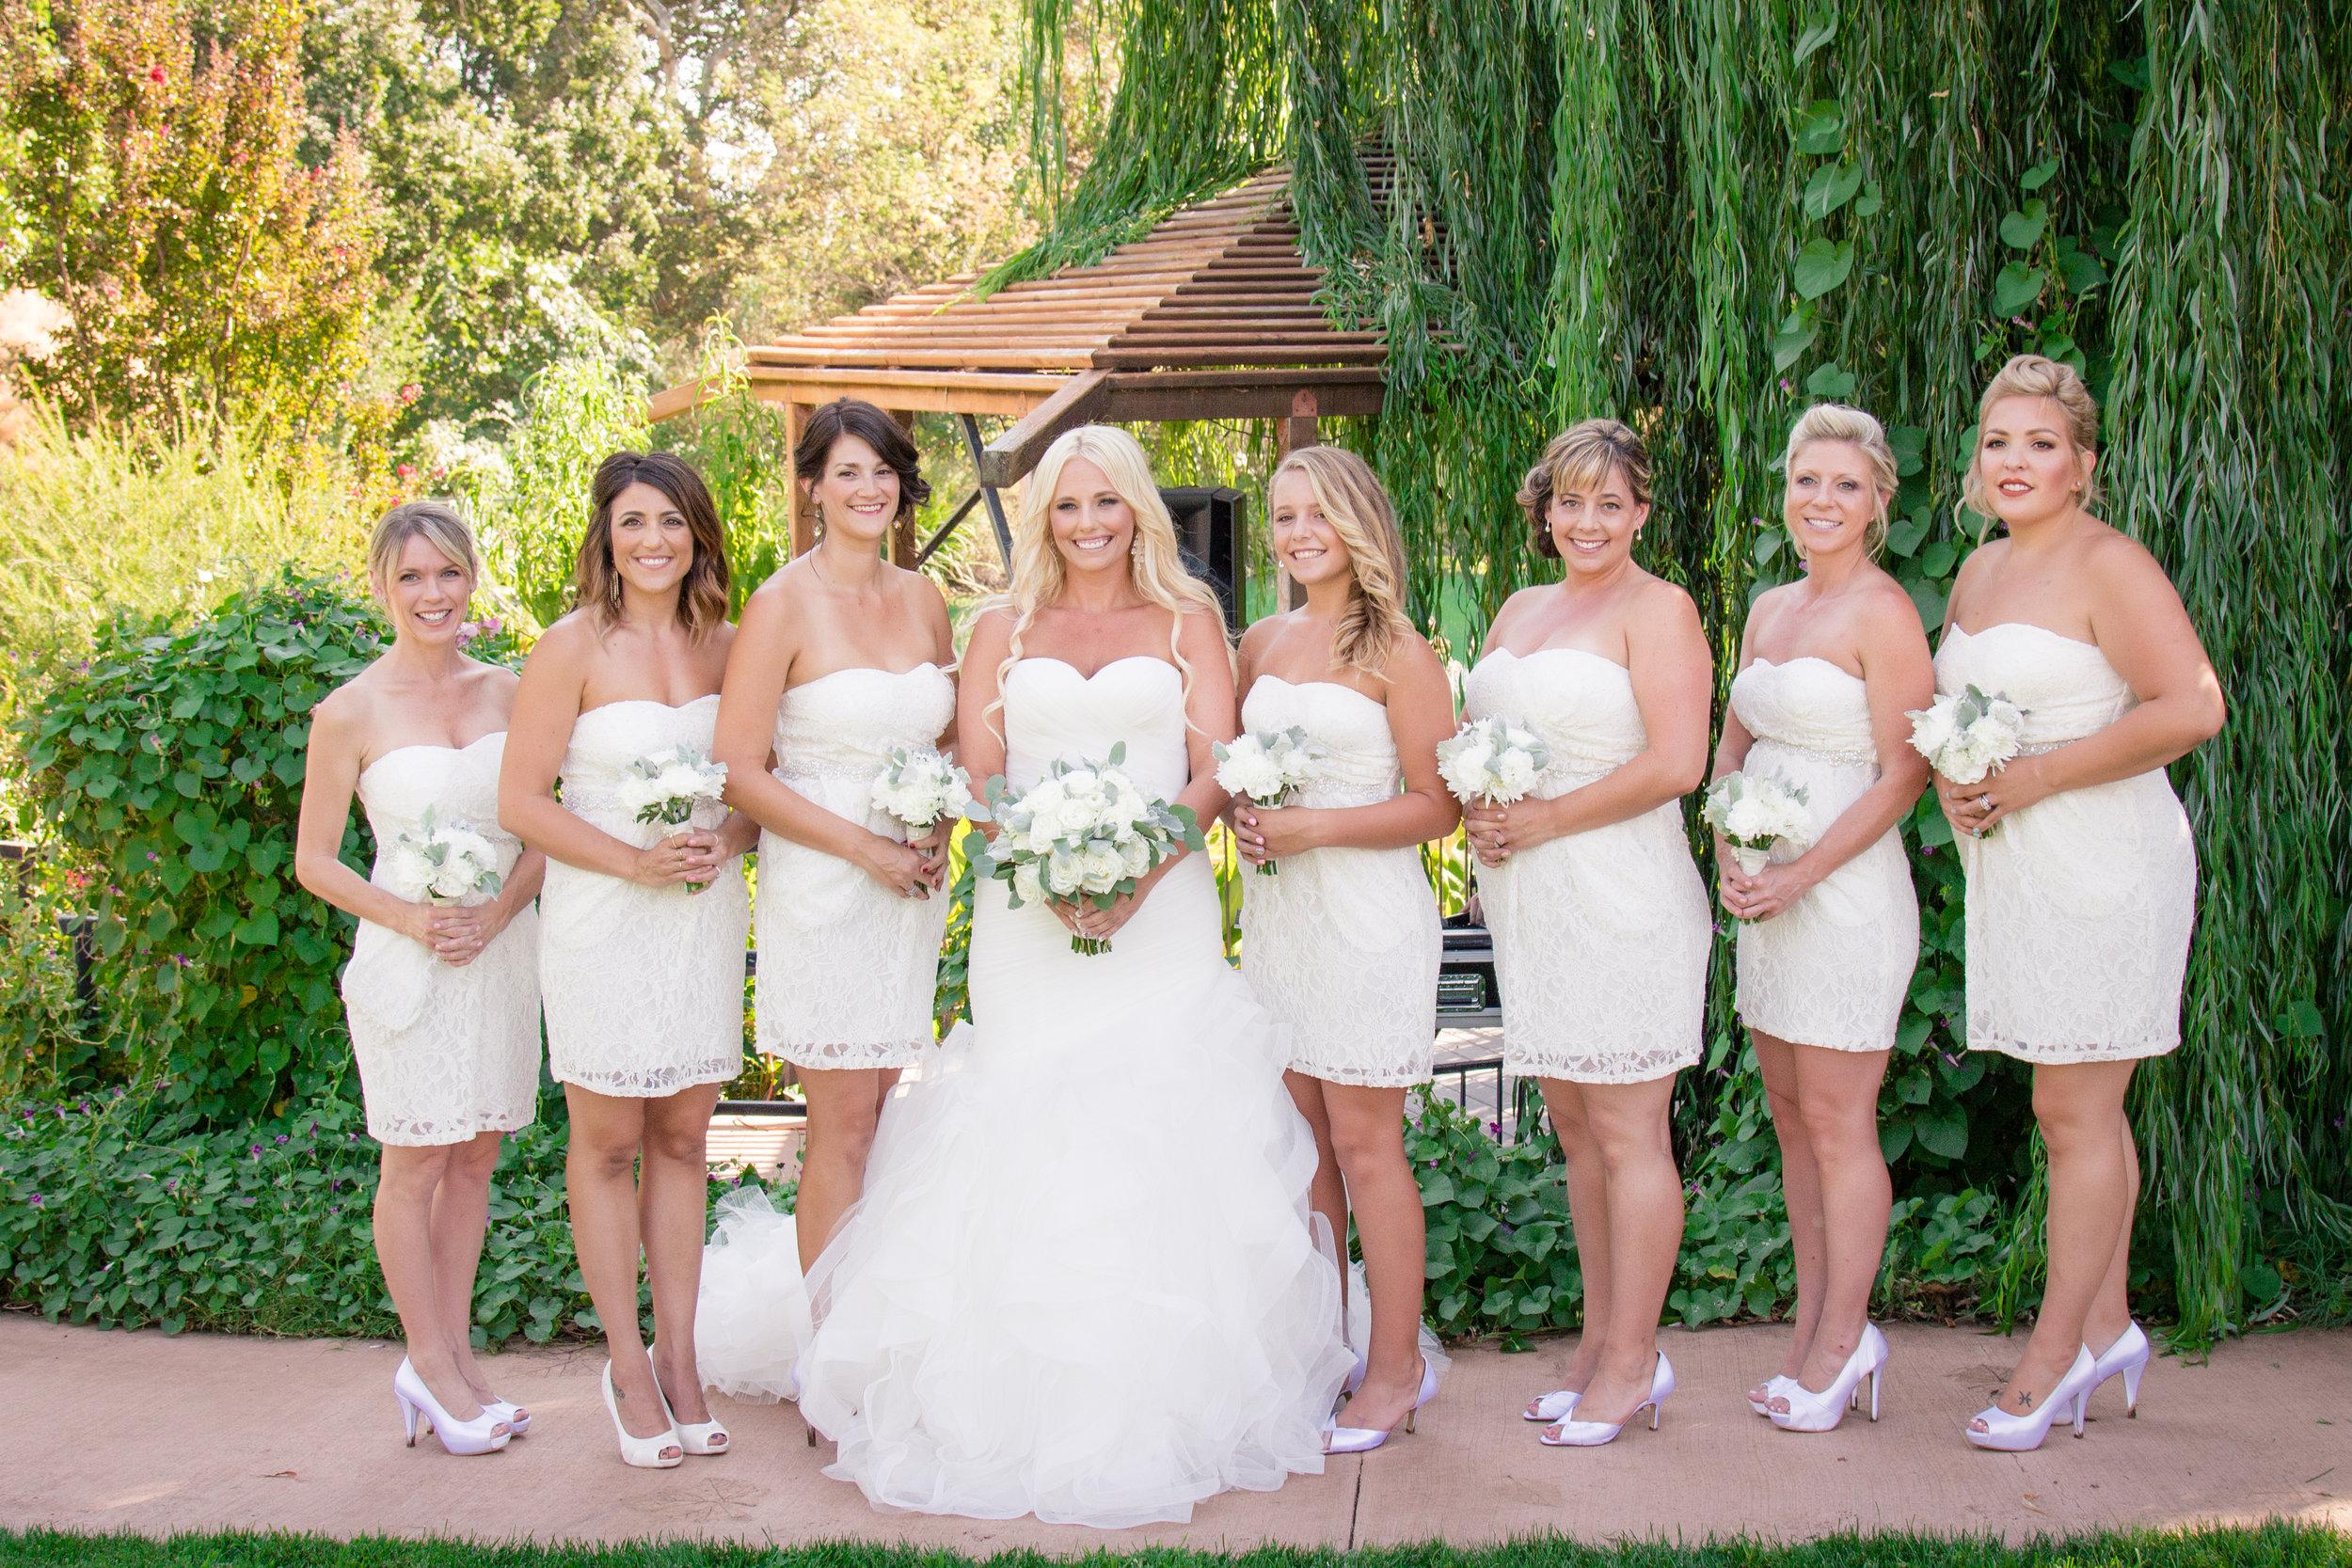 White Ranch Events - Chico - Ashley Teasley Photography - Sacramento Wedding Photographer10.JPG